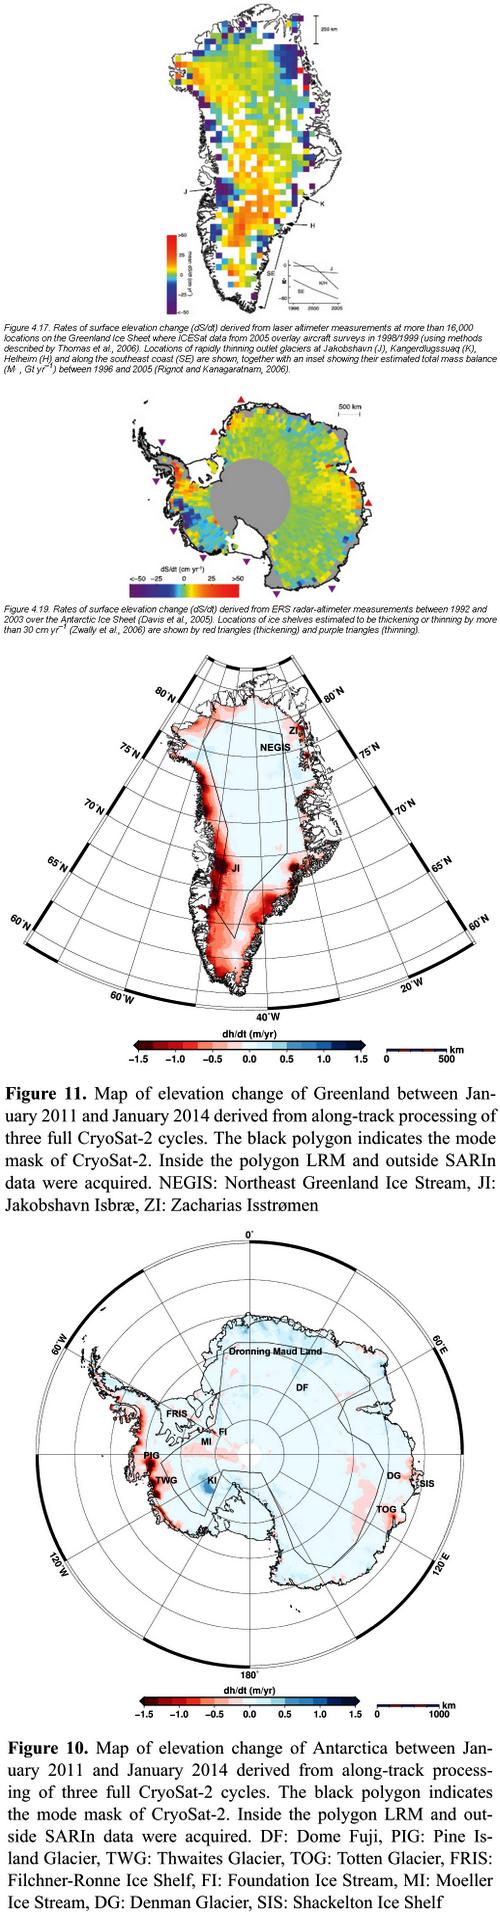 Eis-Groenland-Antarktis